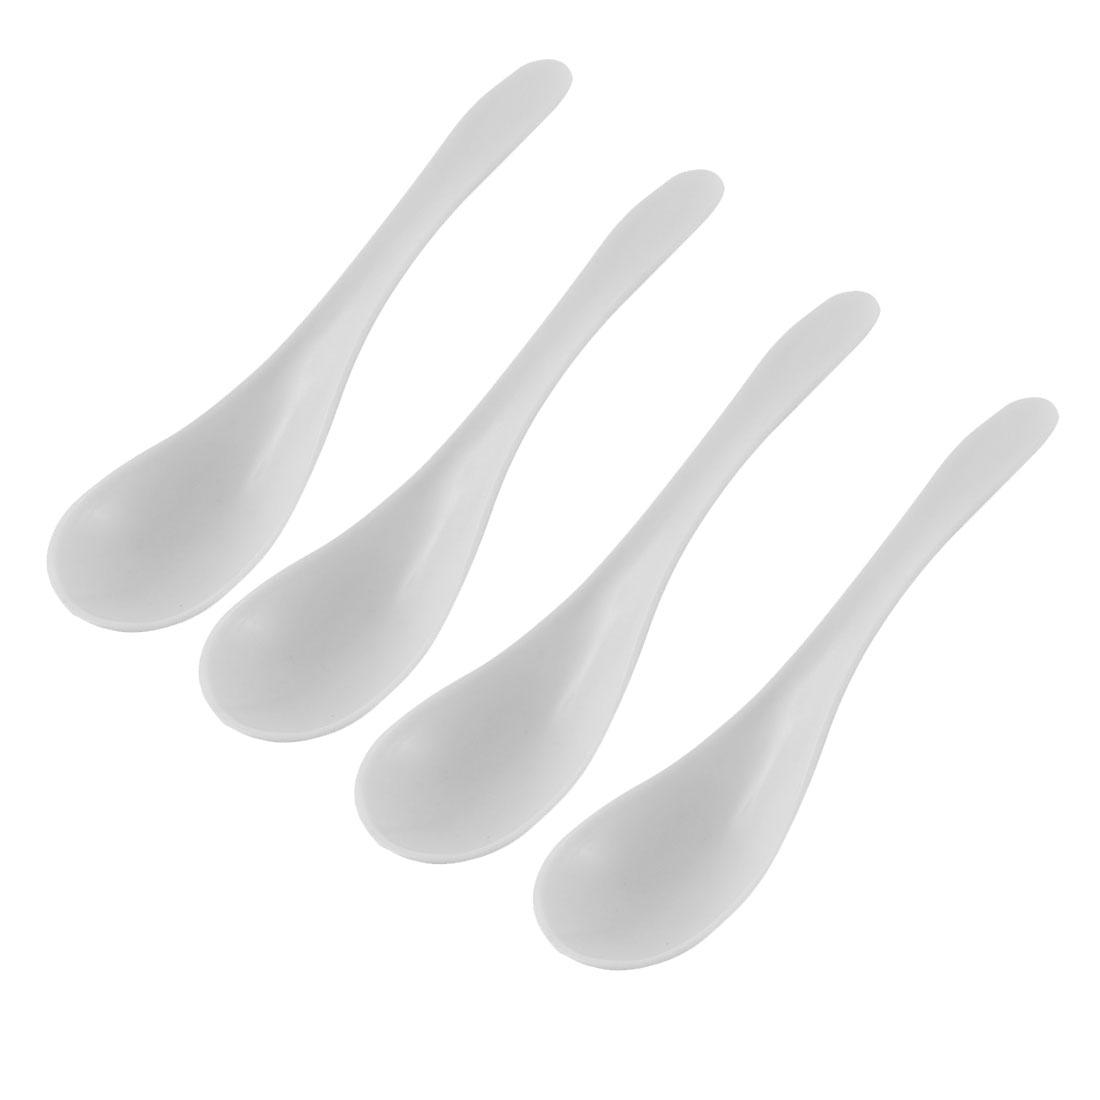 "Kitchenware Platic Soup Porridge Food Rice Spoon Ladle 5.7"" Length 4pcs White"